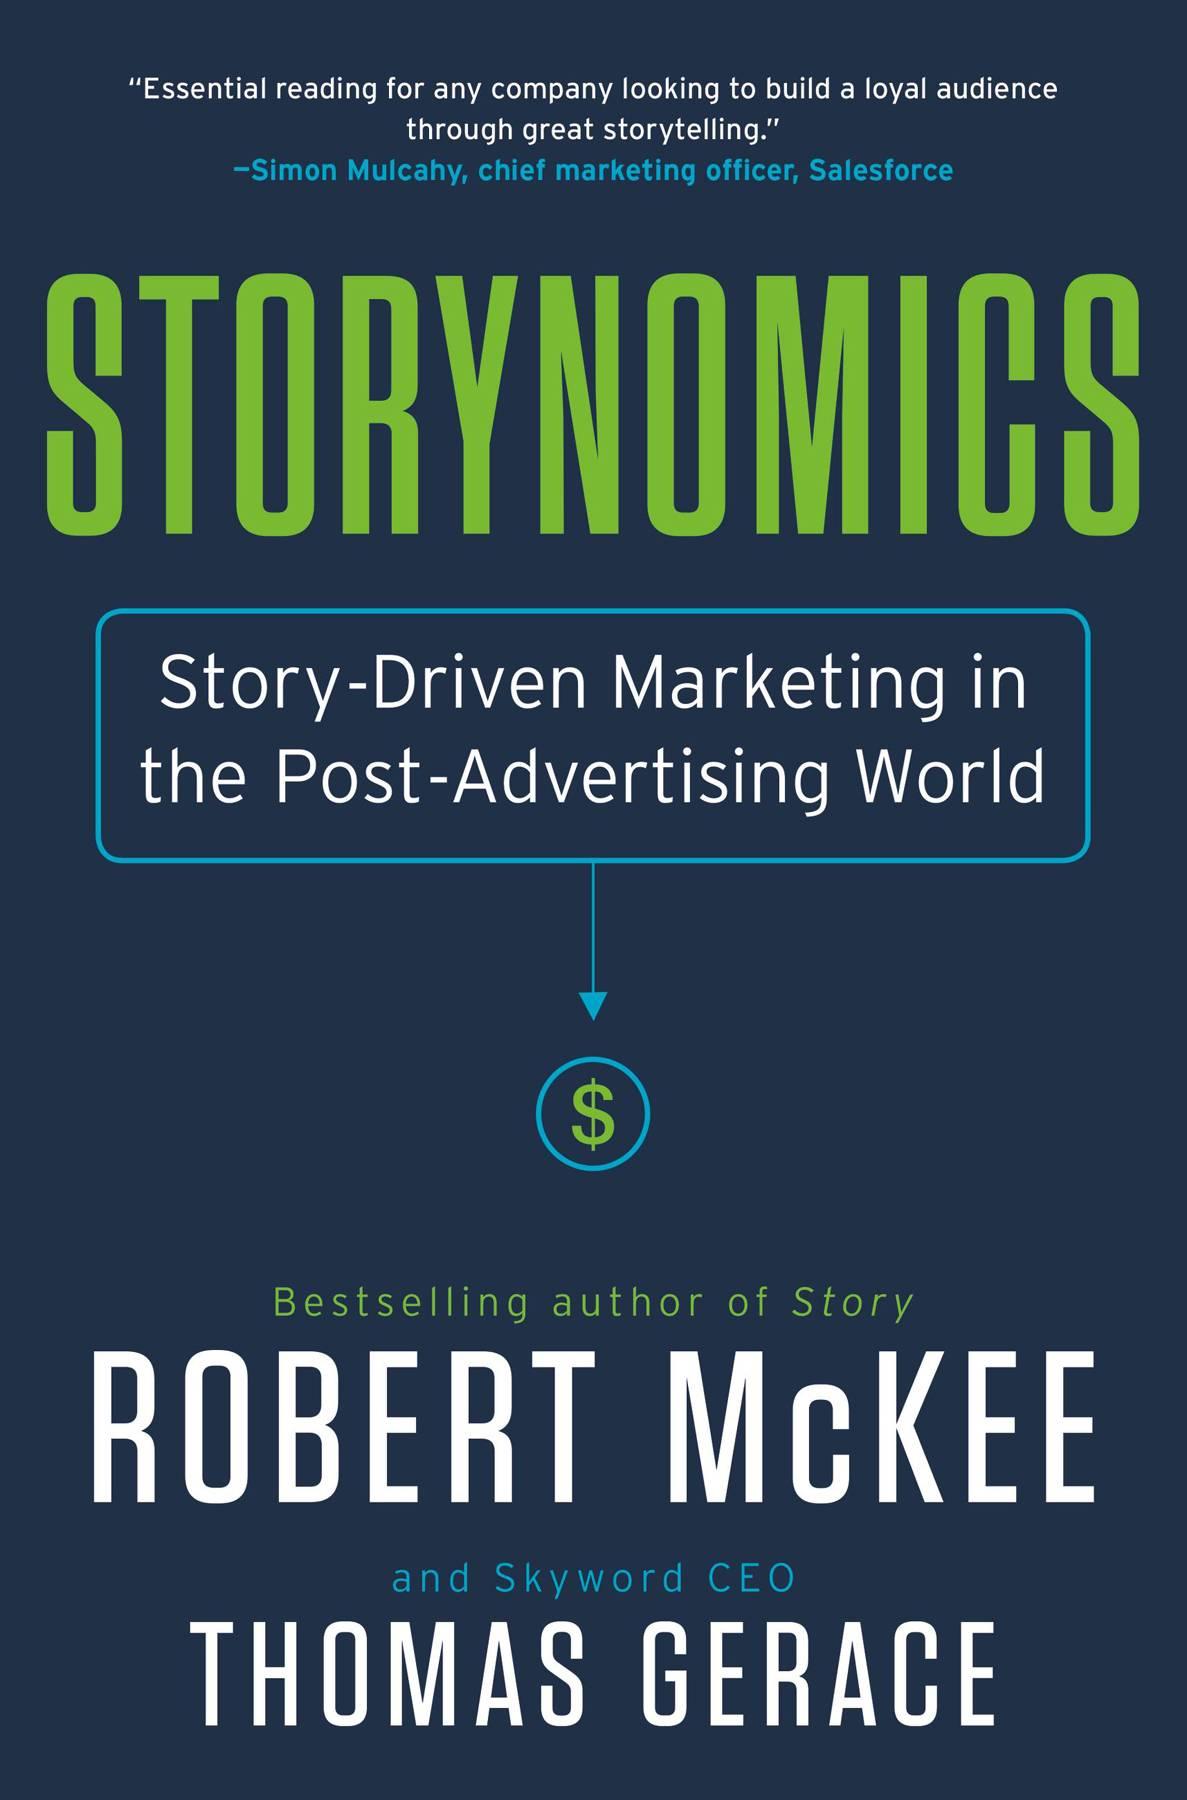 storynomics